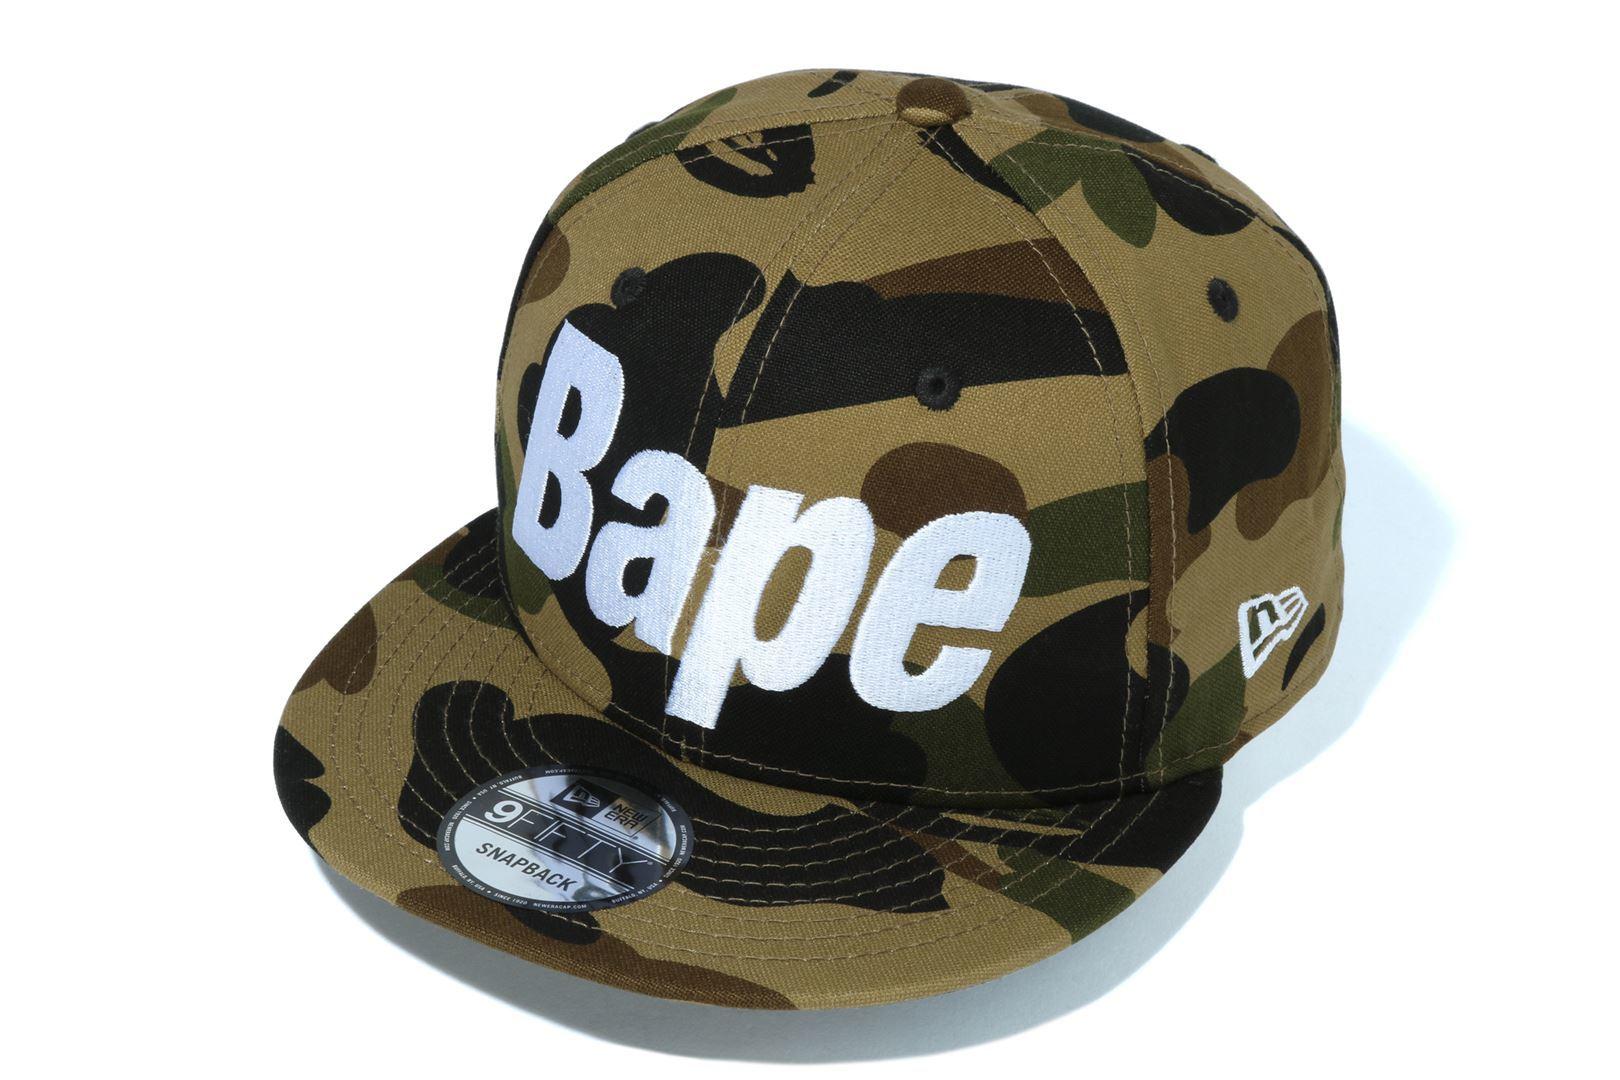 1ST CAMO BAPE NEW ERA SNAP BACK CAP_a0174495_17593528.jpg